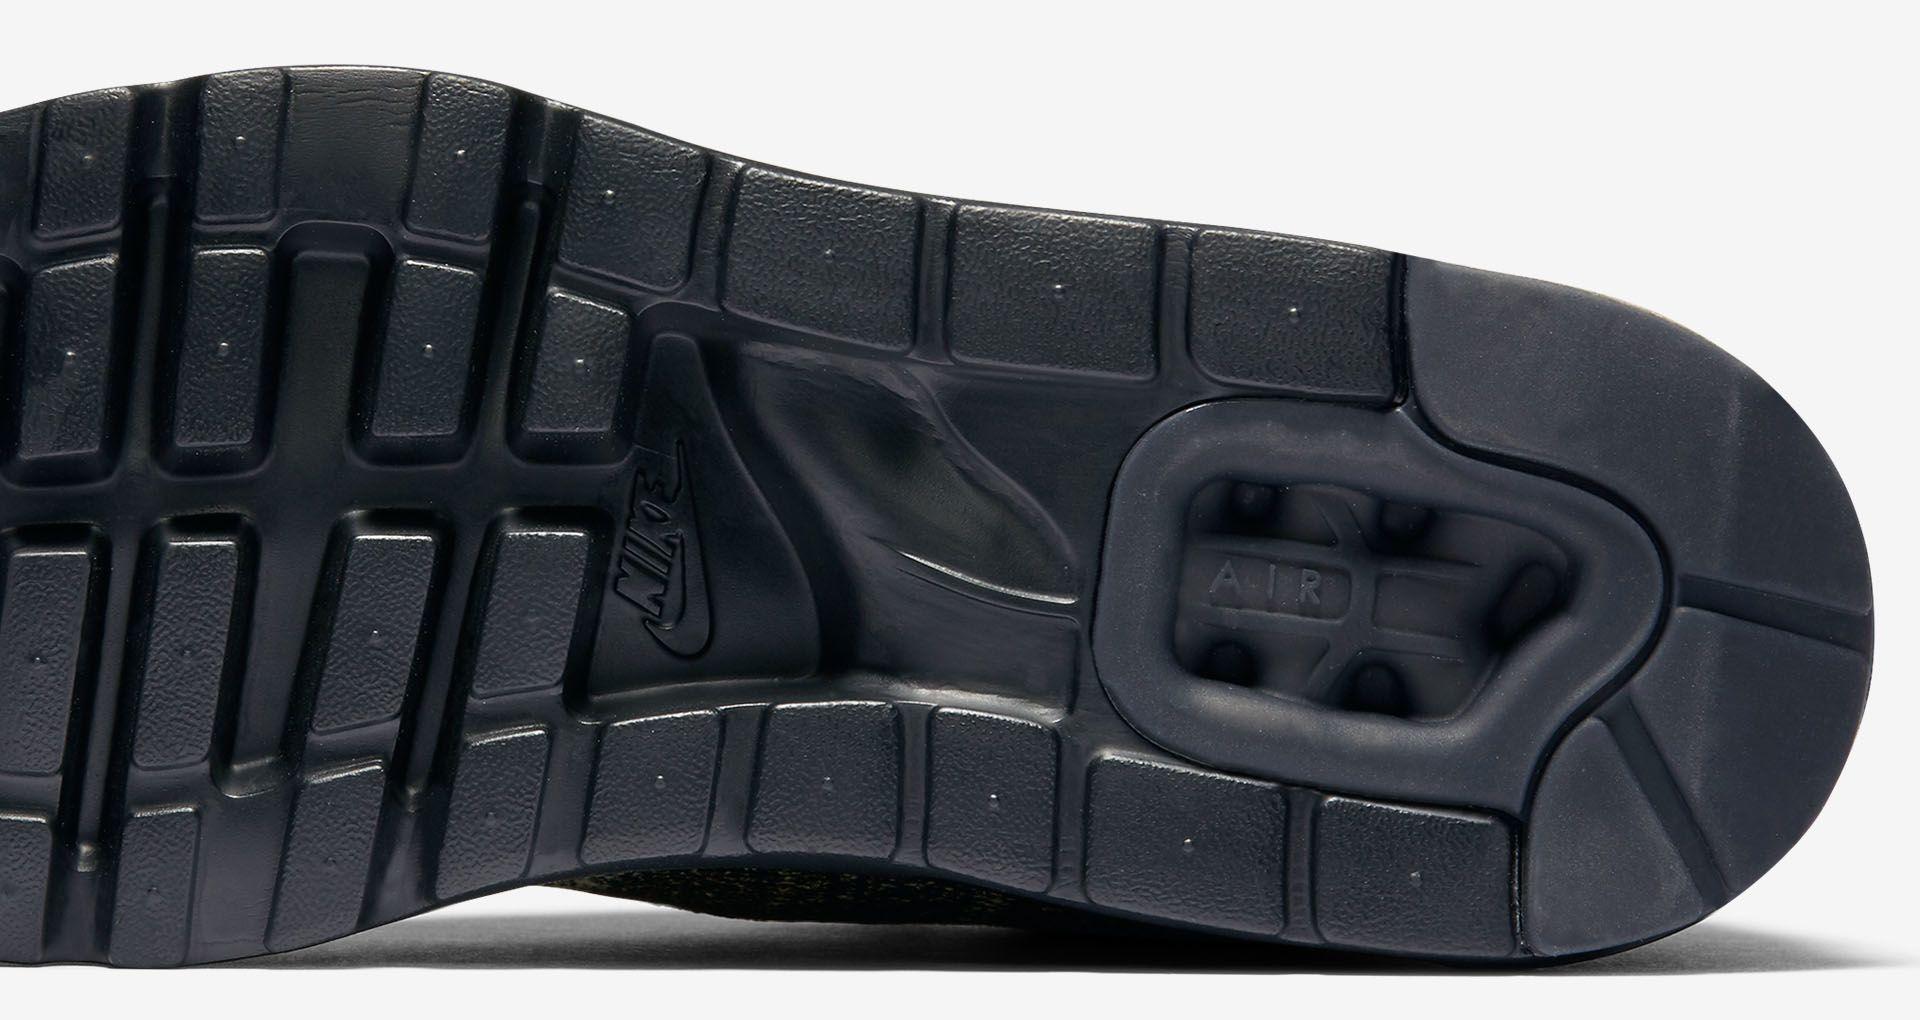 Nike Air Max 1 Ultra Flyknit 'Neutral Olive & Black'. Nike SNKRS